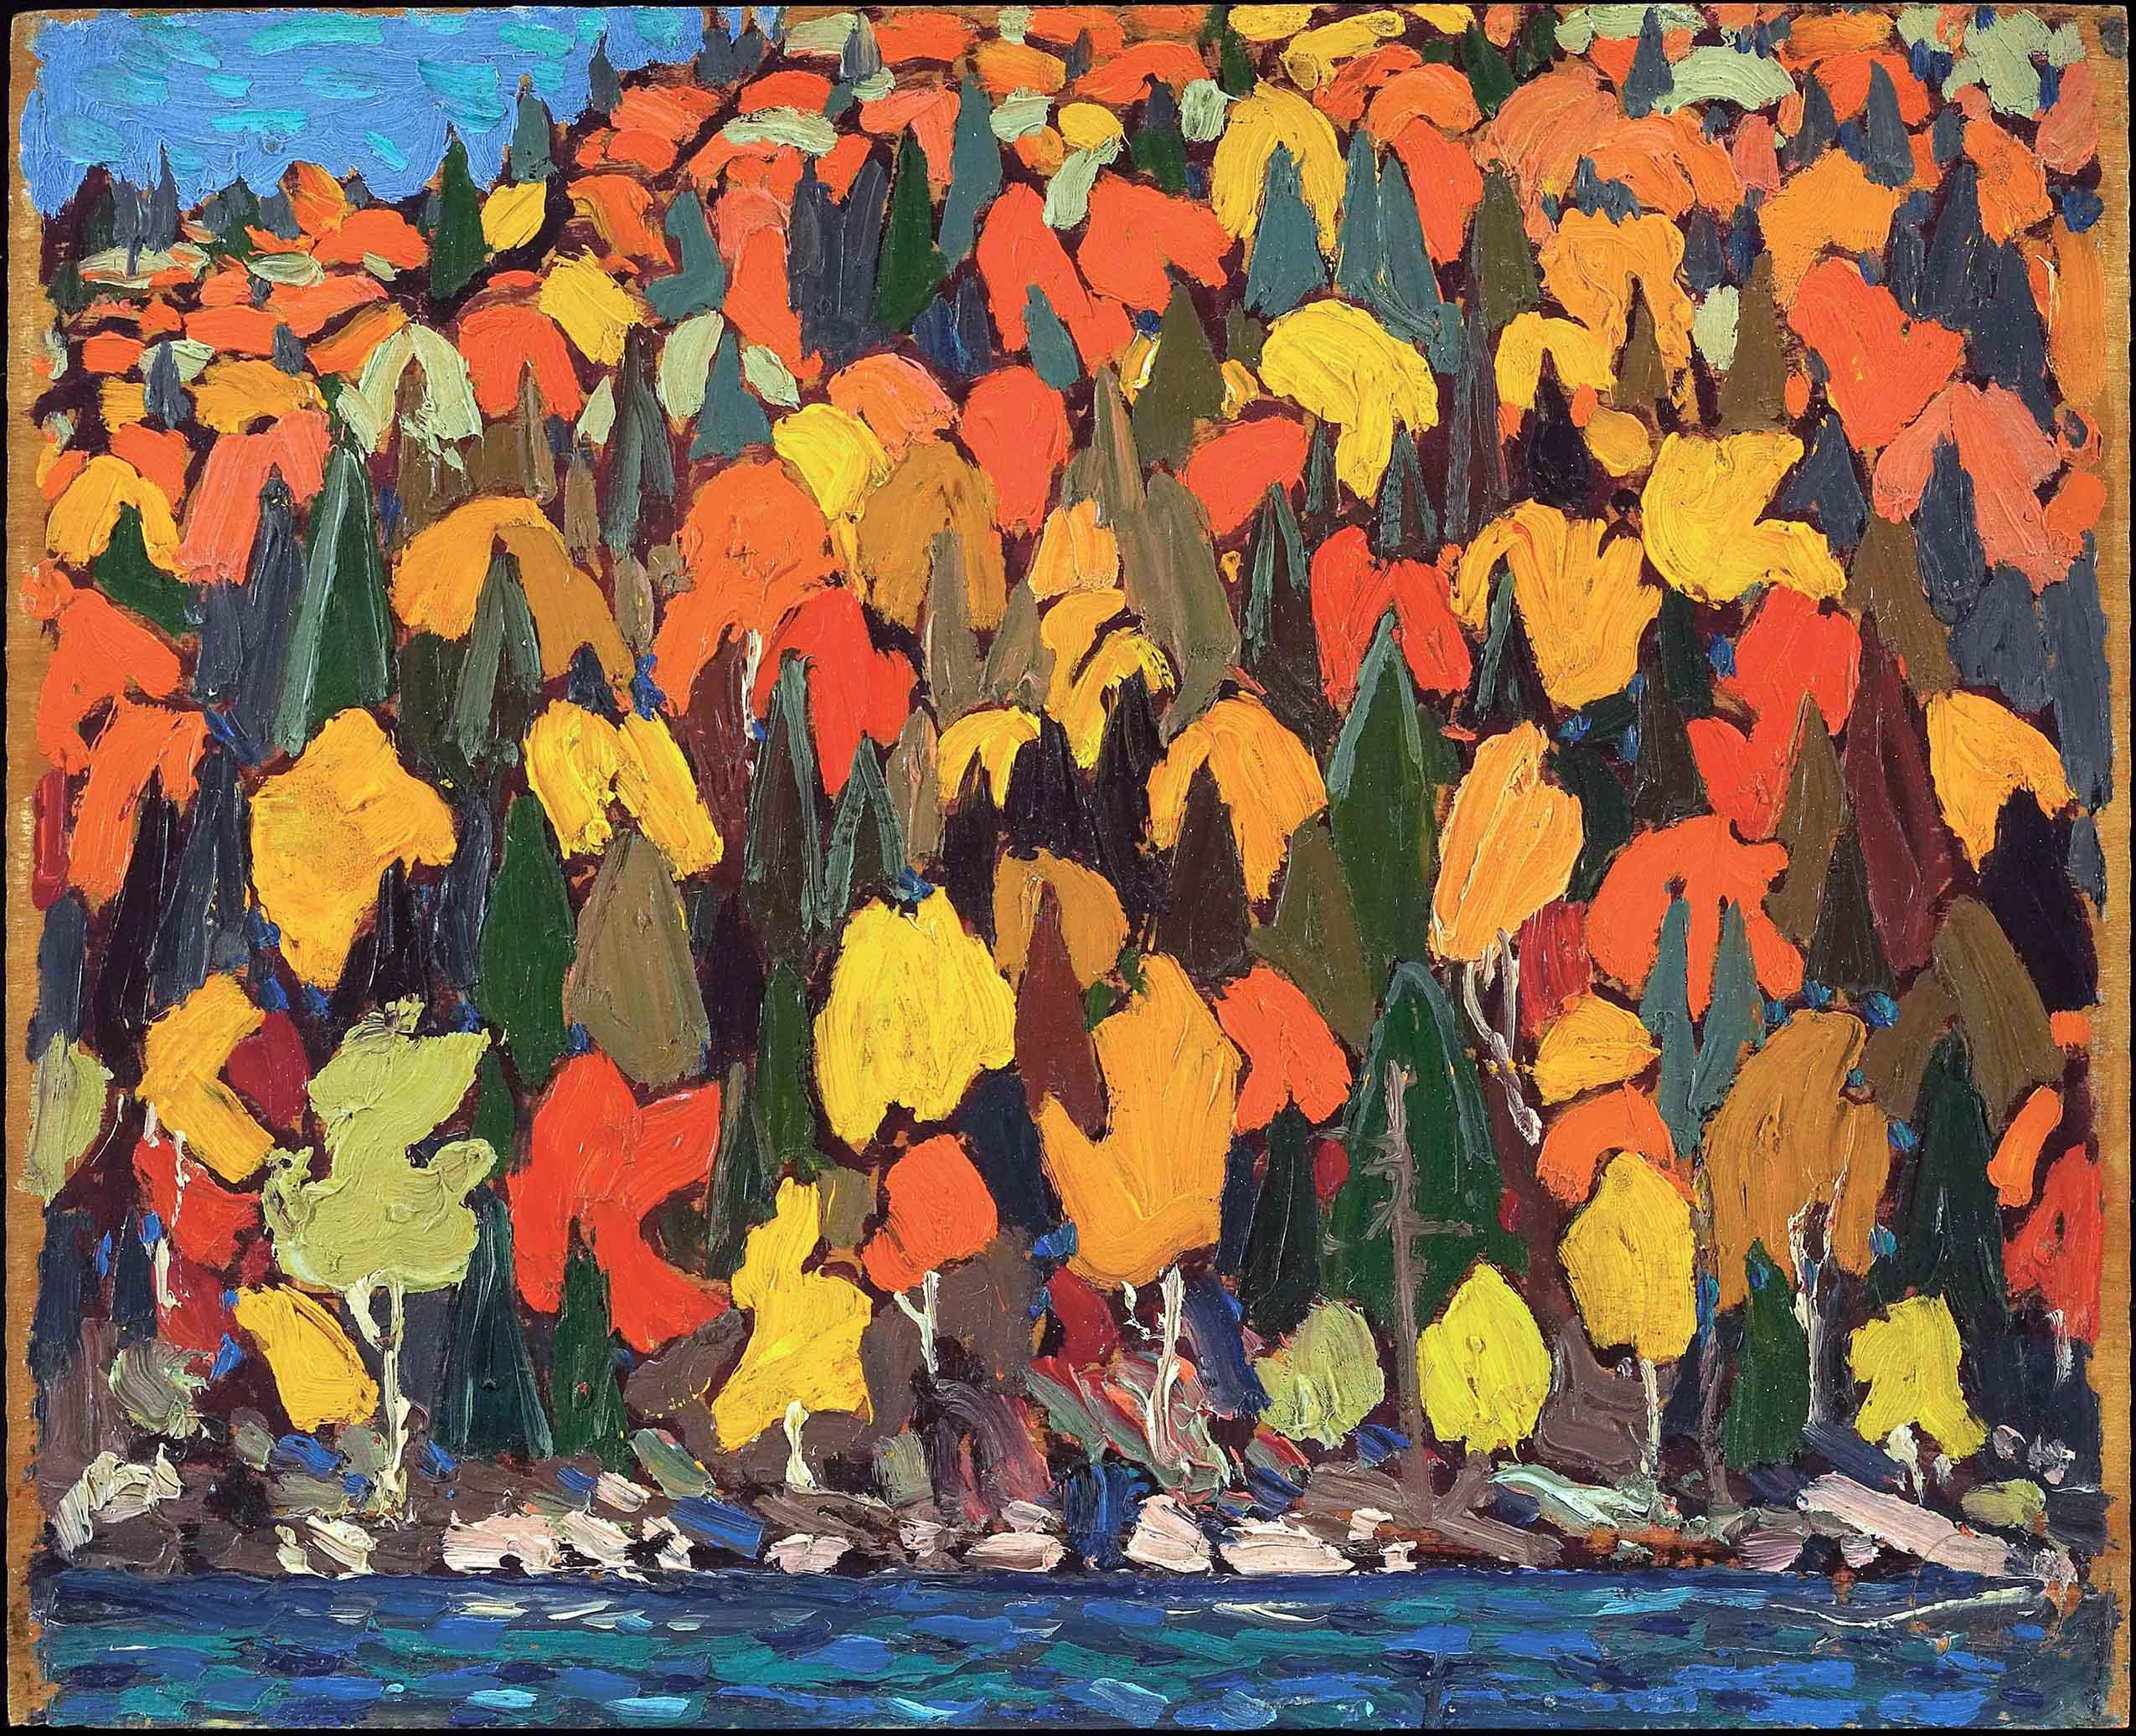 Tom_Thomson_-_Autumn_Foliage_-_Google_Art_Project